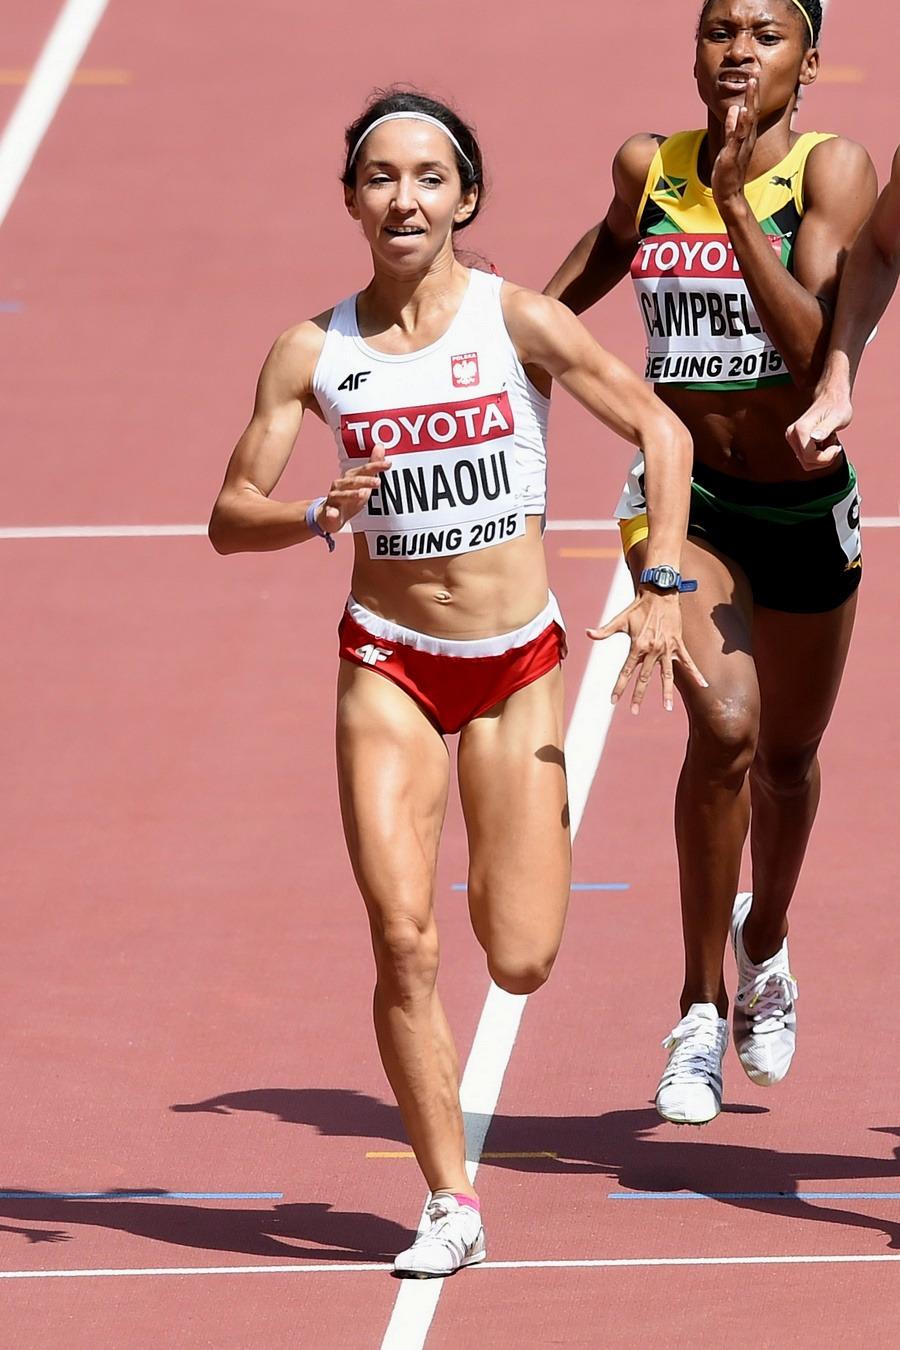 Sofia Ennaoui (Poland) 2015 World Championships – Gymnastics